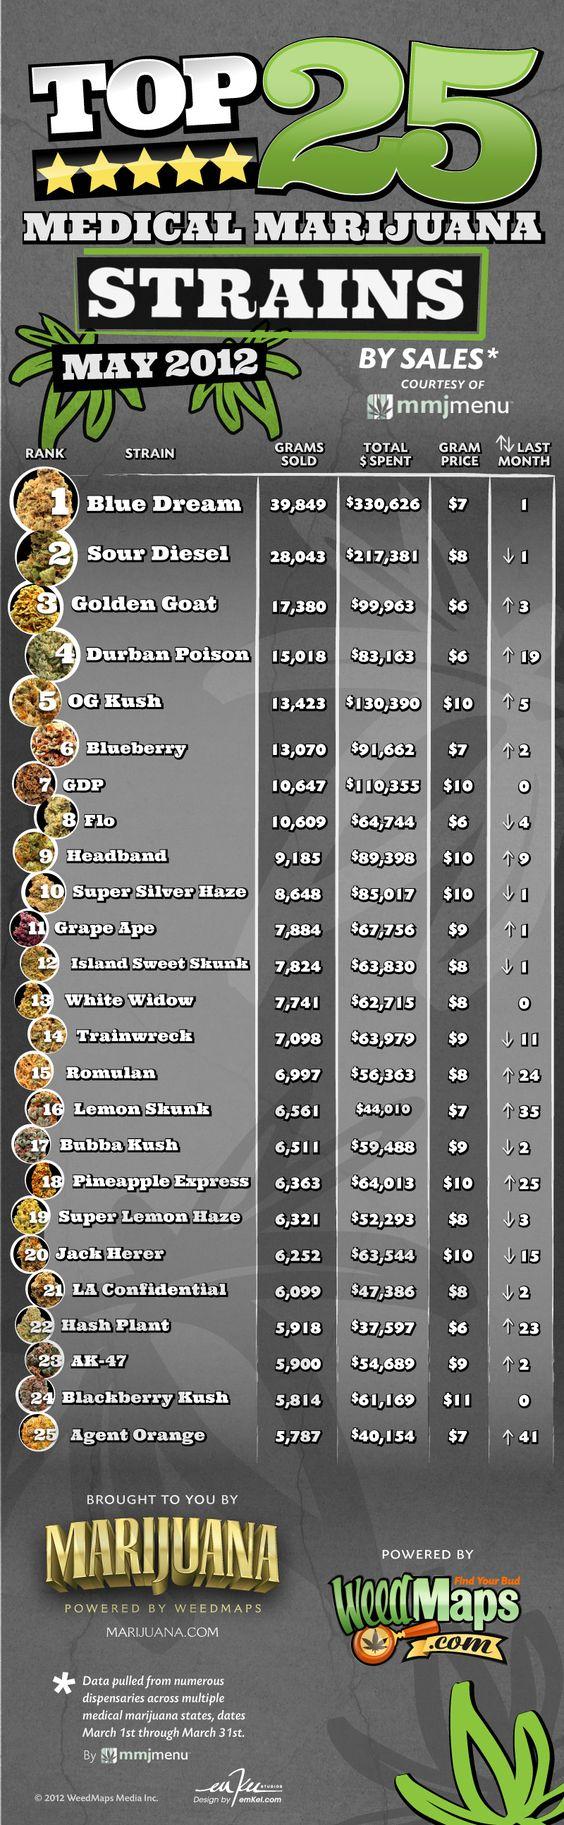 Top 25 Medical Marijuana: May 2012